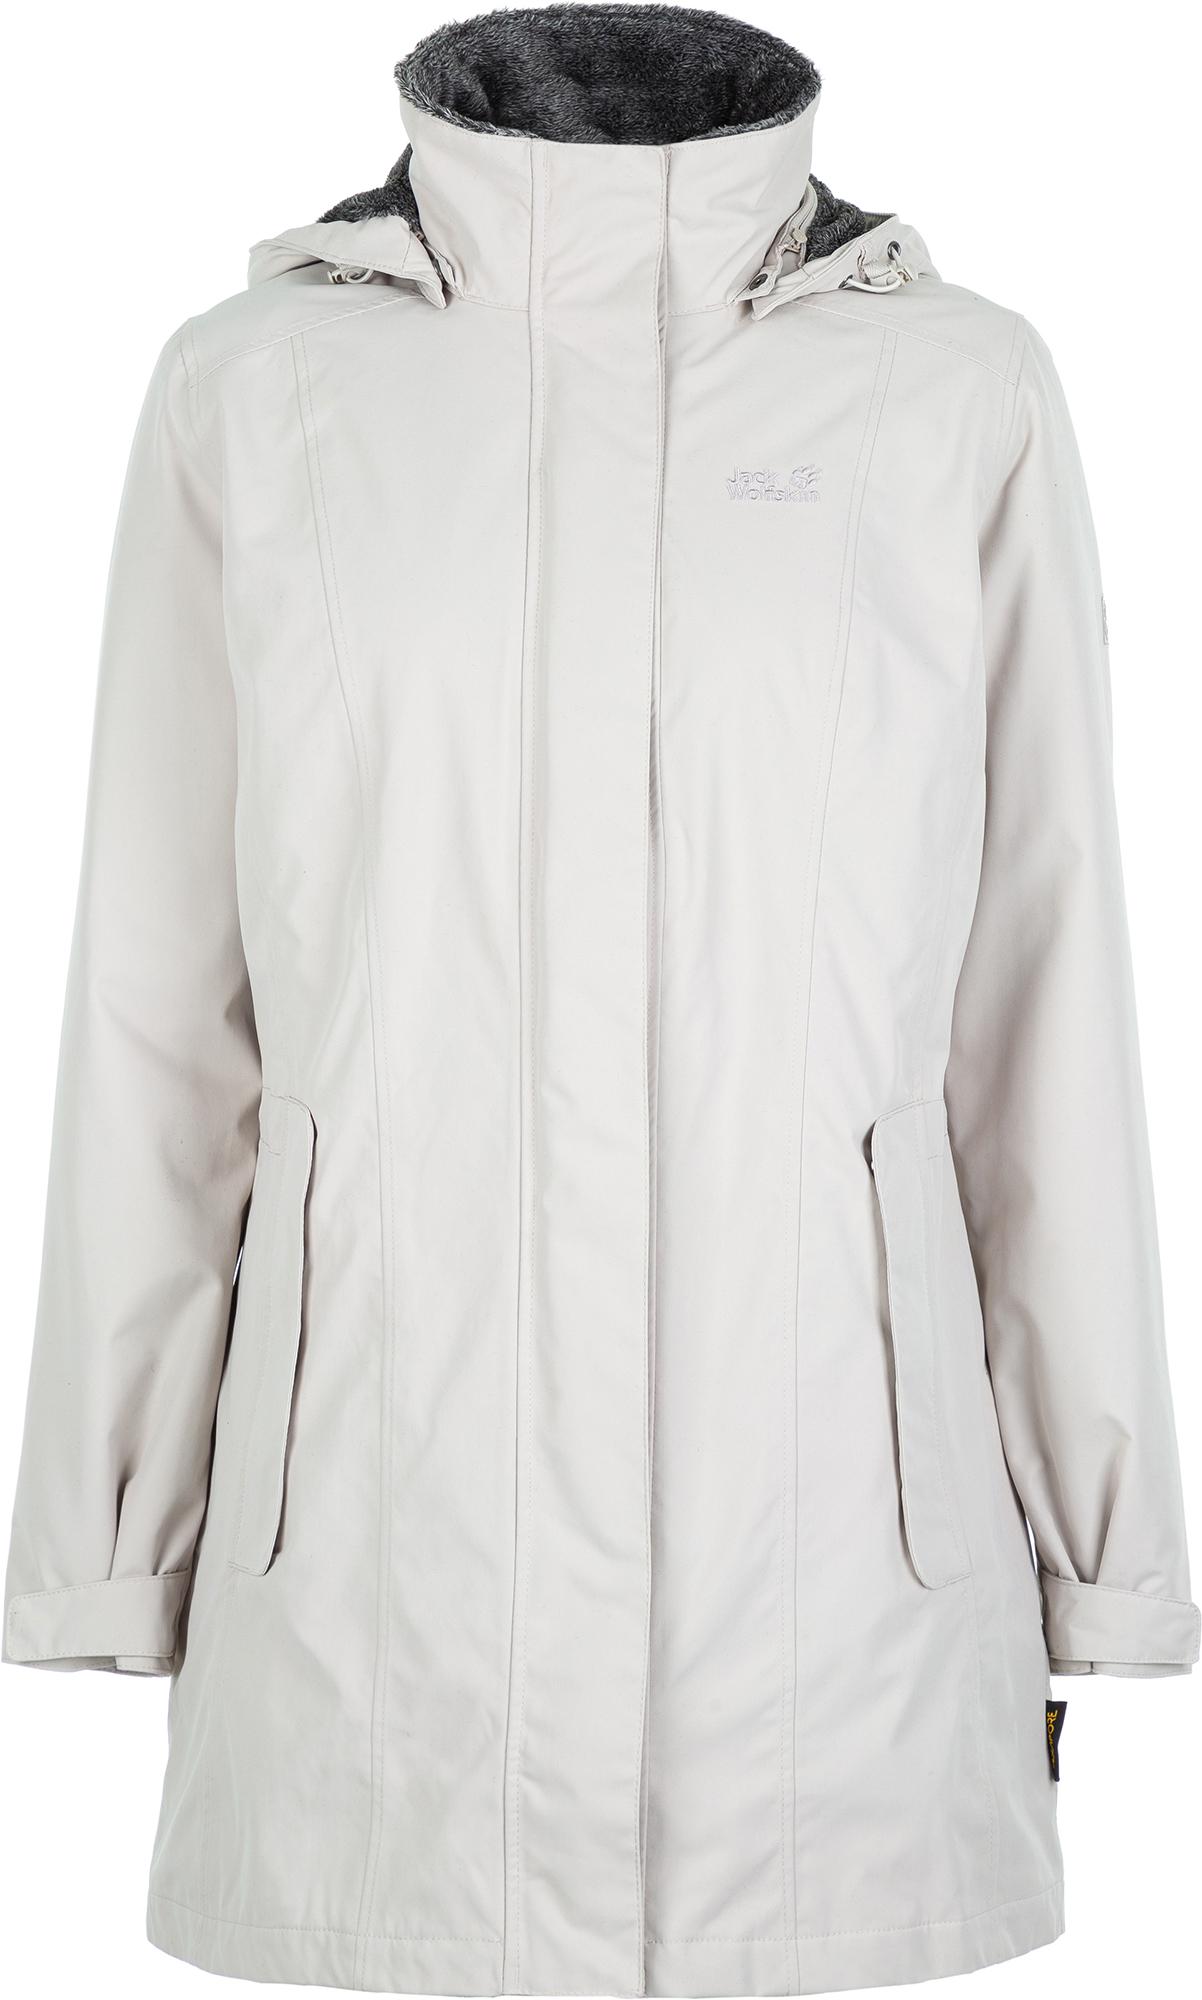 Jack Wolfskin Куртка утепленная женская Jack Wolfskin Madison Avenue, размер 52-54 цена и фото